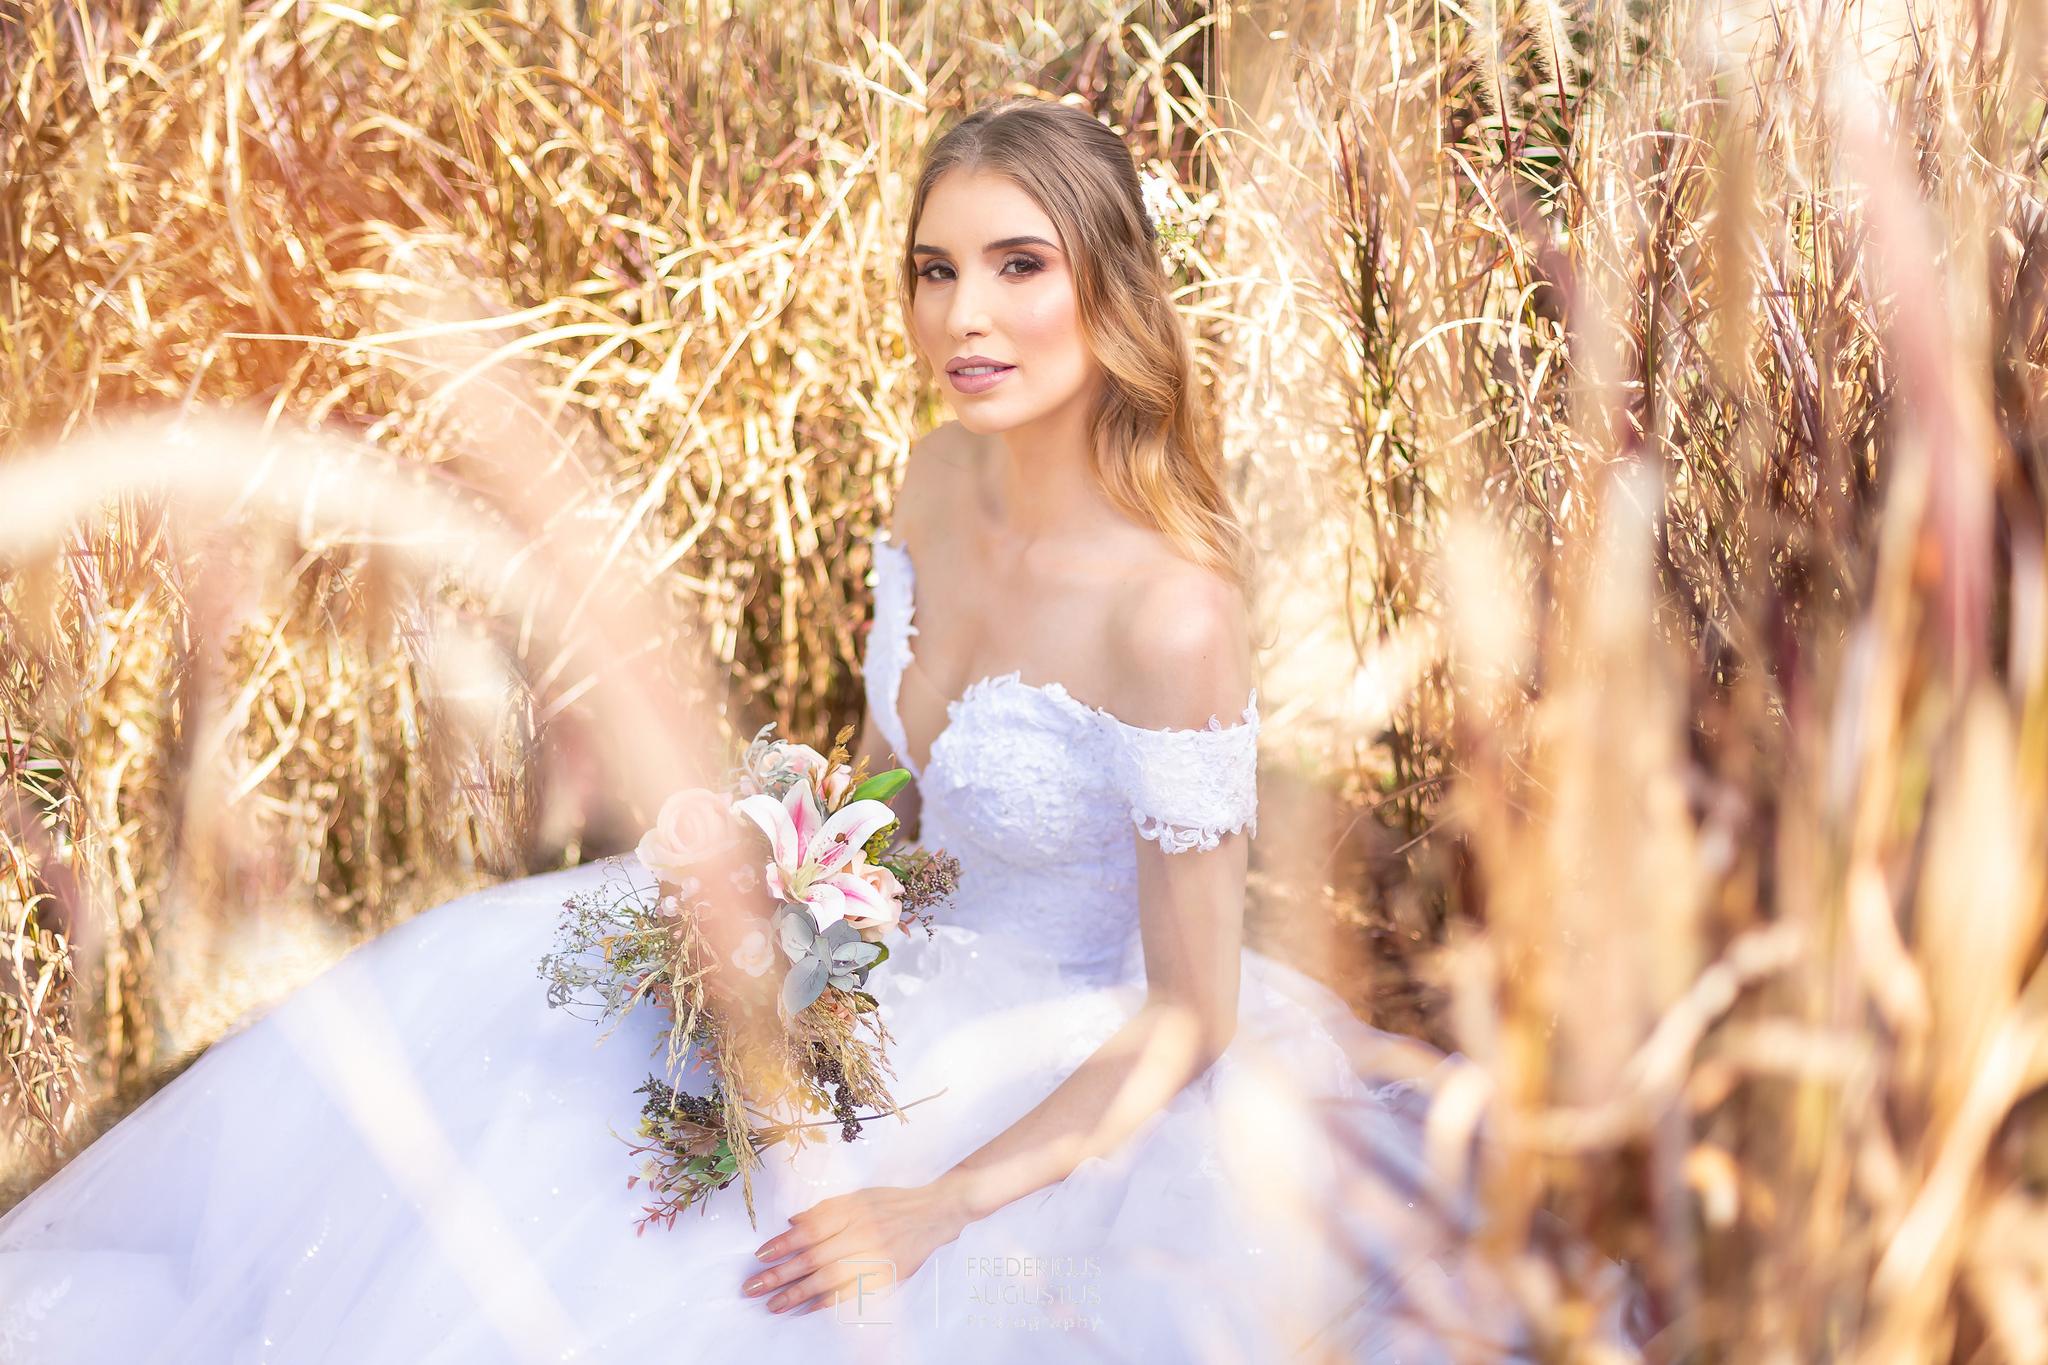 O fotógrafo Fredericus Augustus fez editorial para noivas se inspirar para o estilo de fotografia do seu casamento